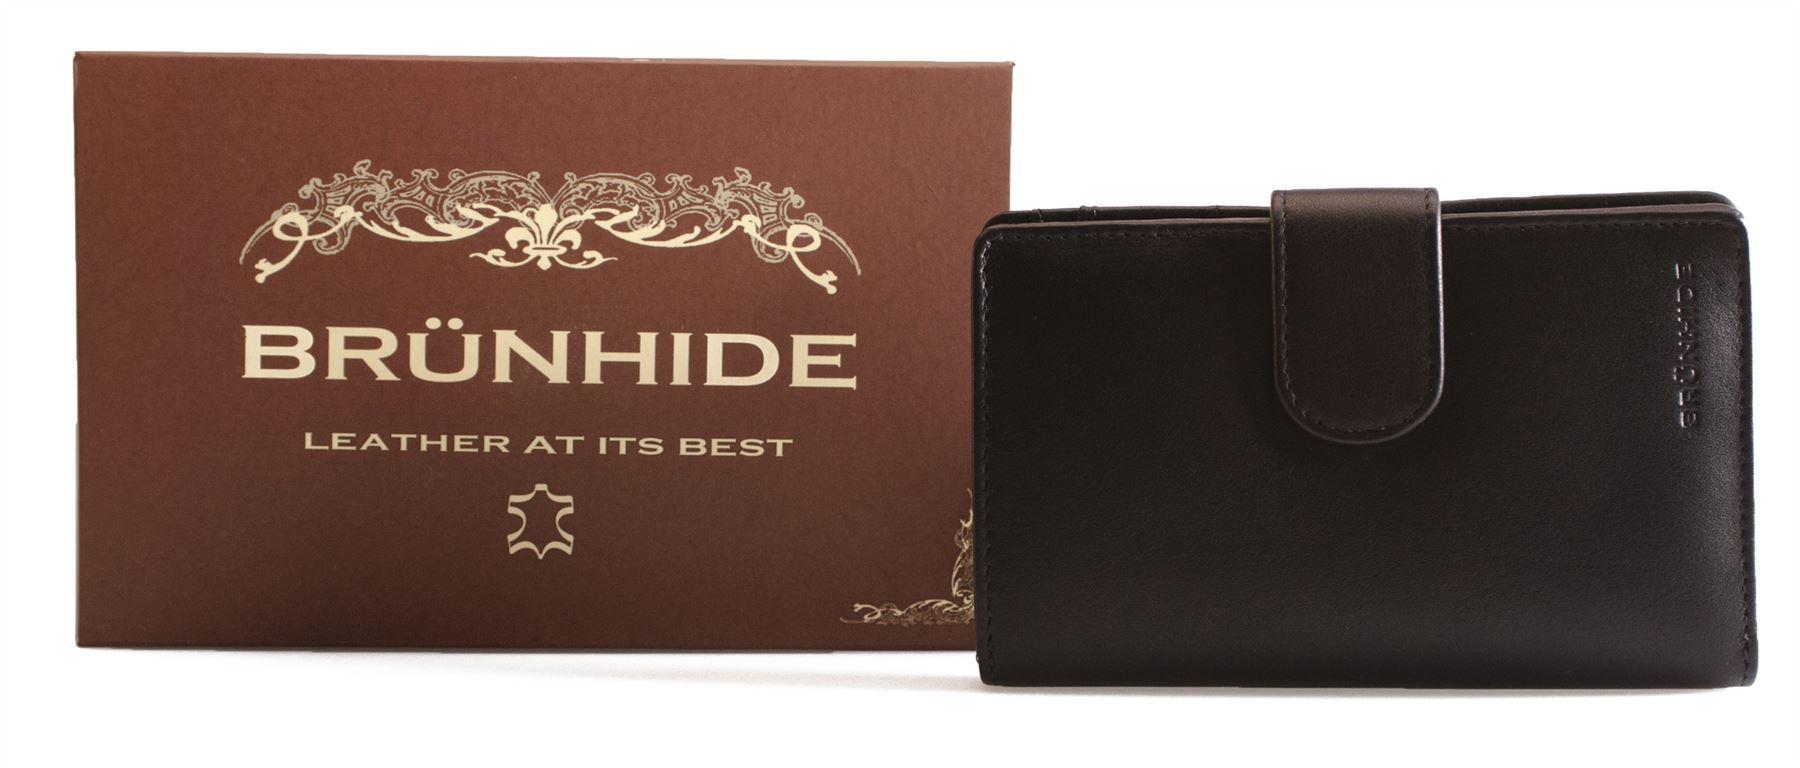 Brunhide-Large-Stivali-in-Pelle-Purse-Wallet-organizer-vera-da-donna-207-300